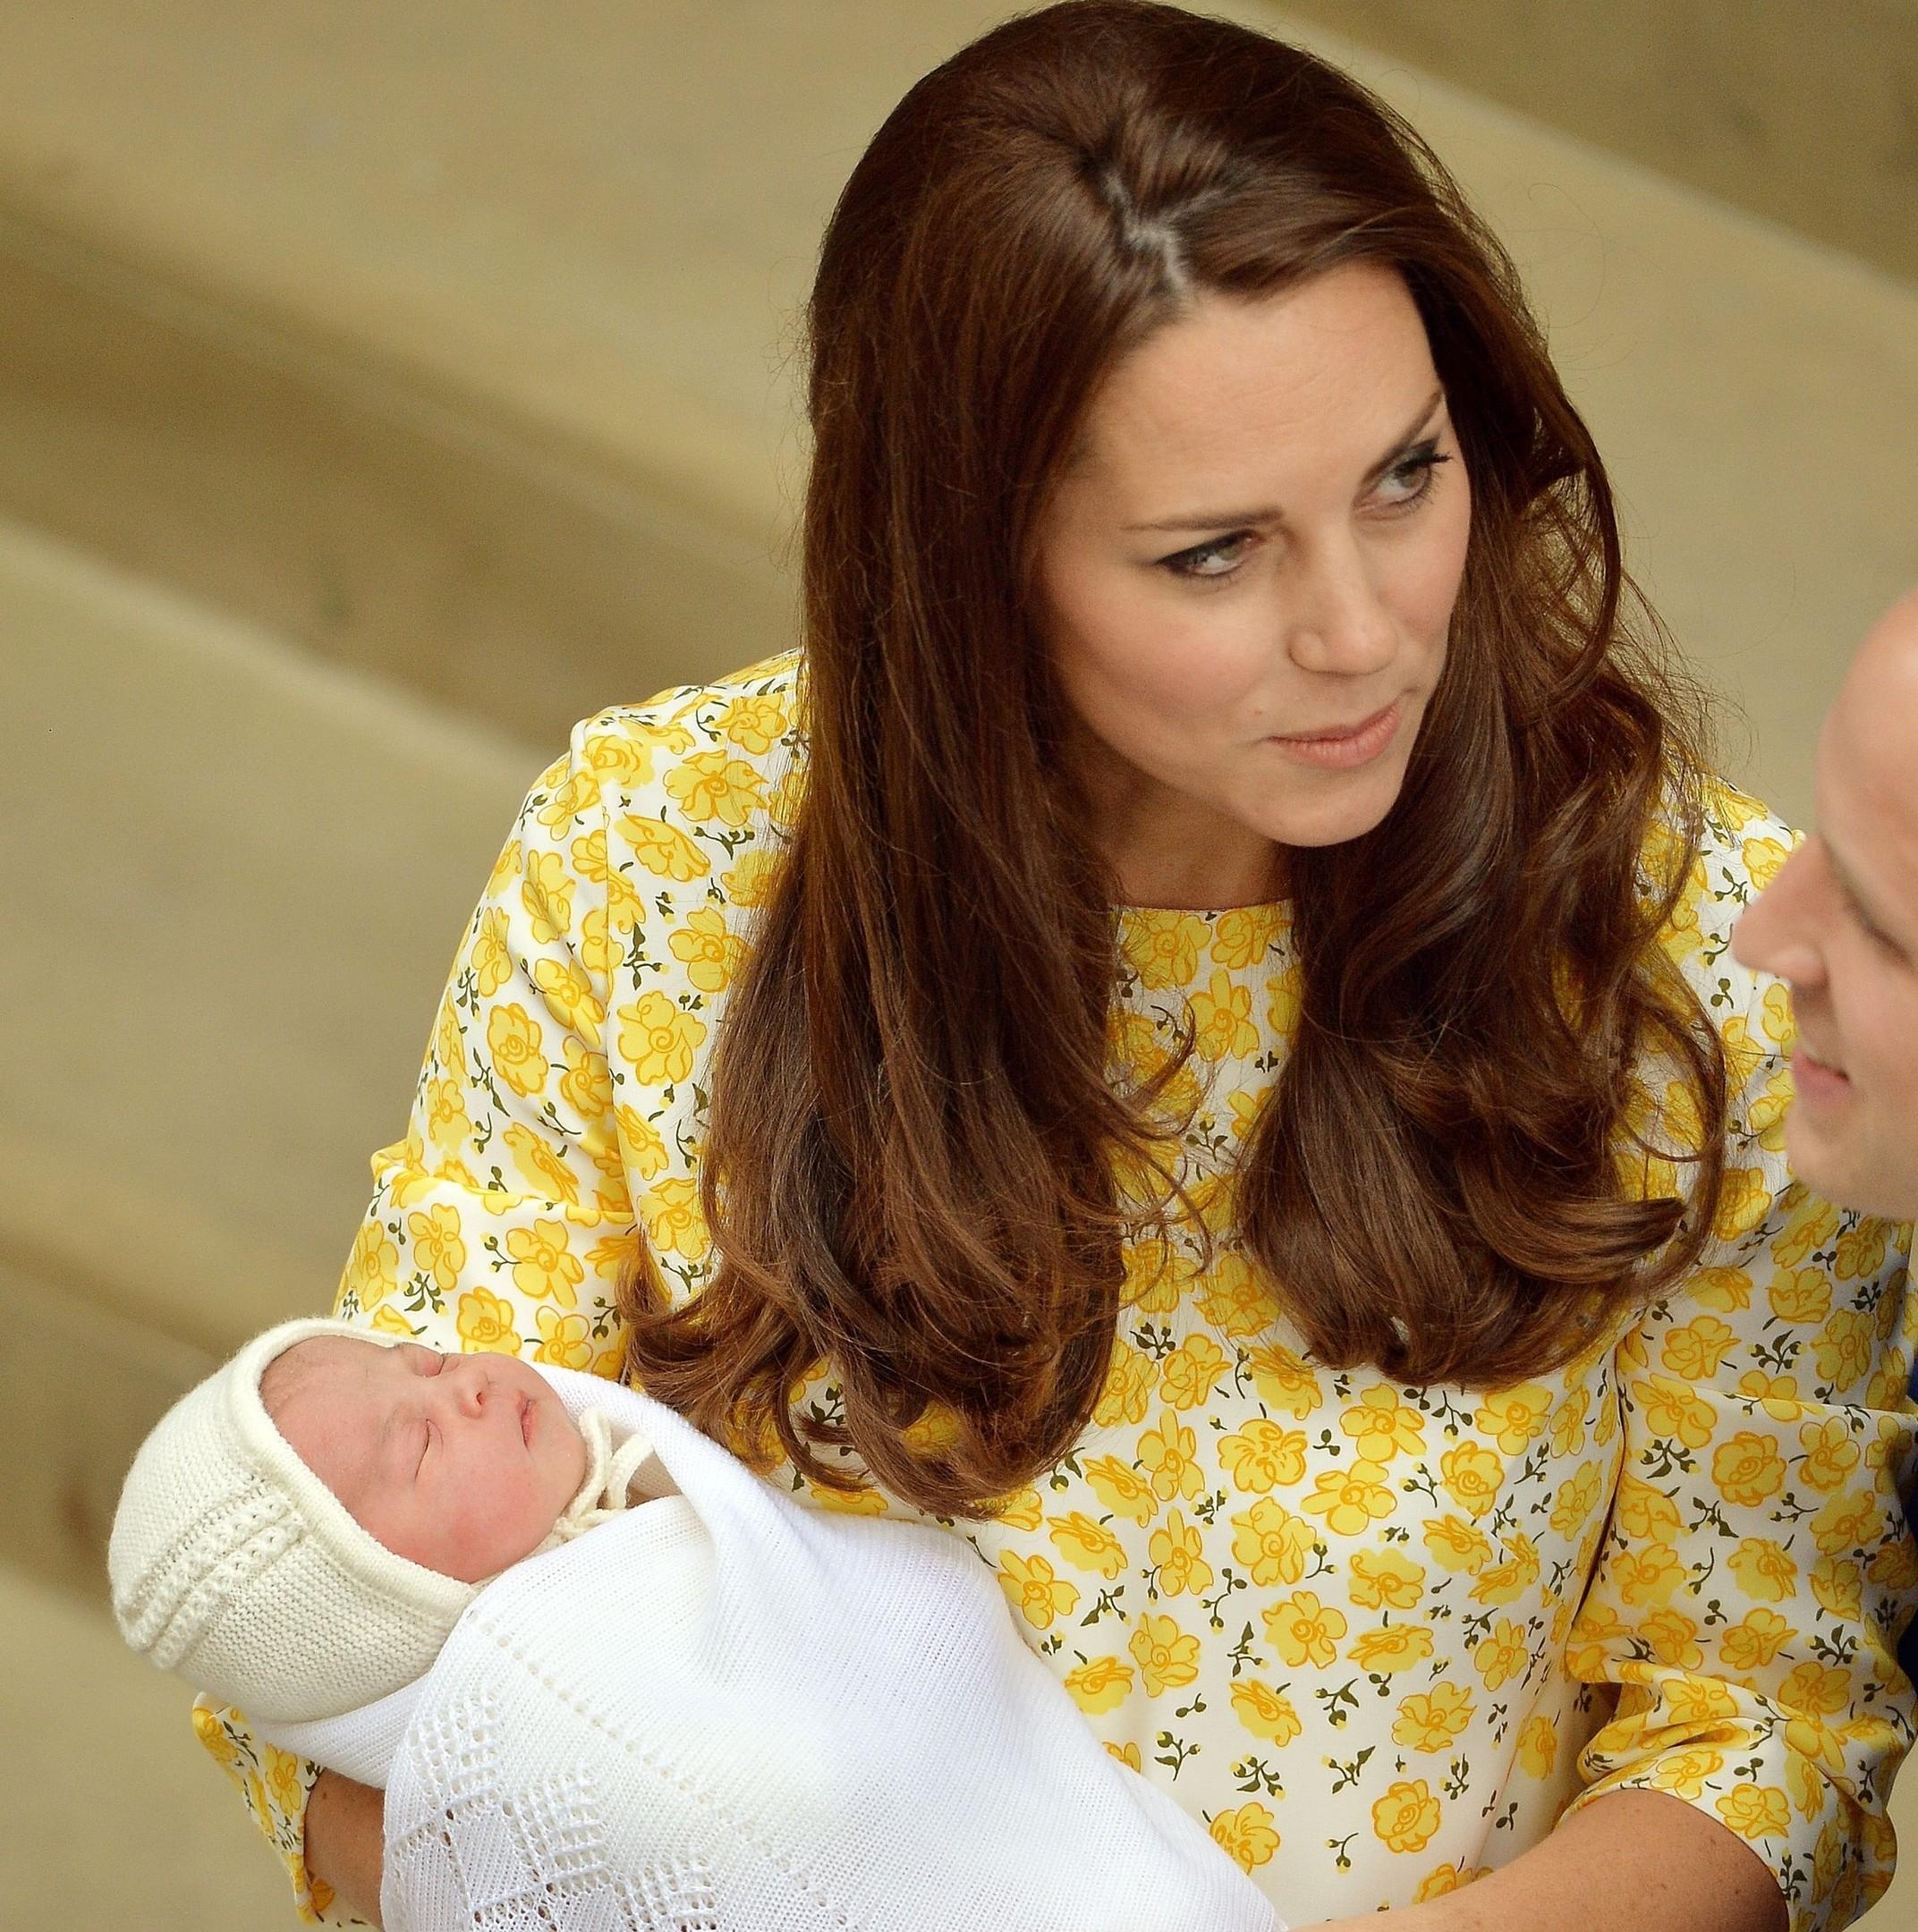 Royal Baby Named As Charlotte Elizabeth Diana